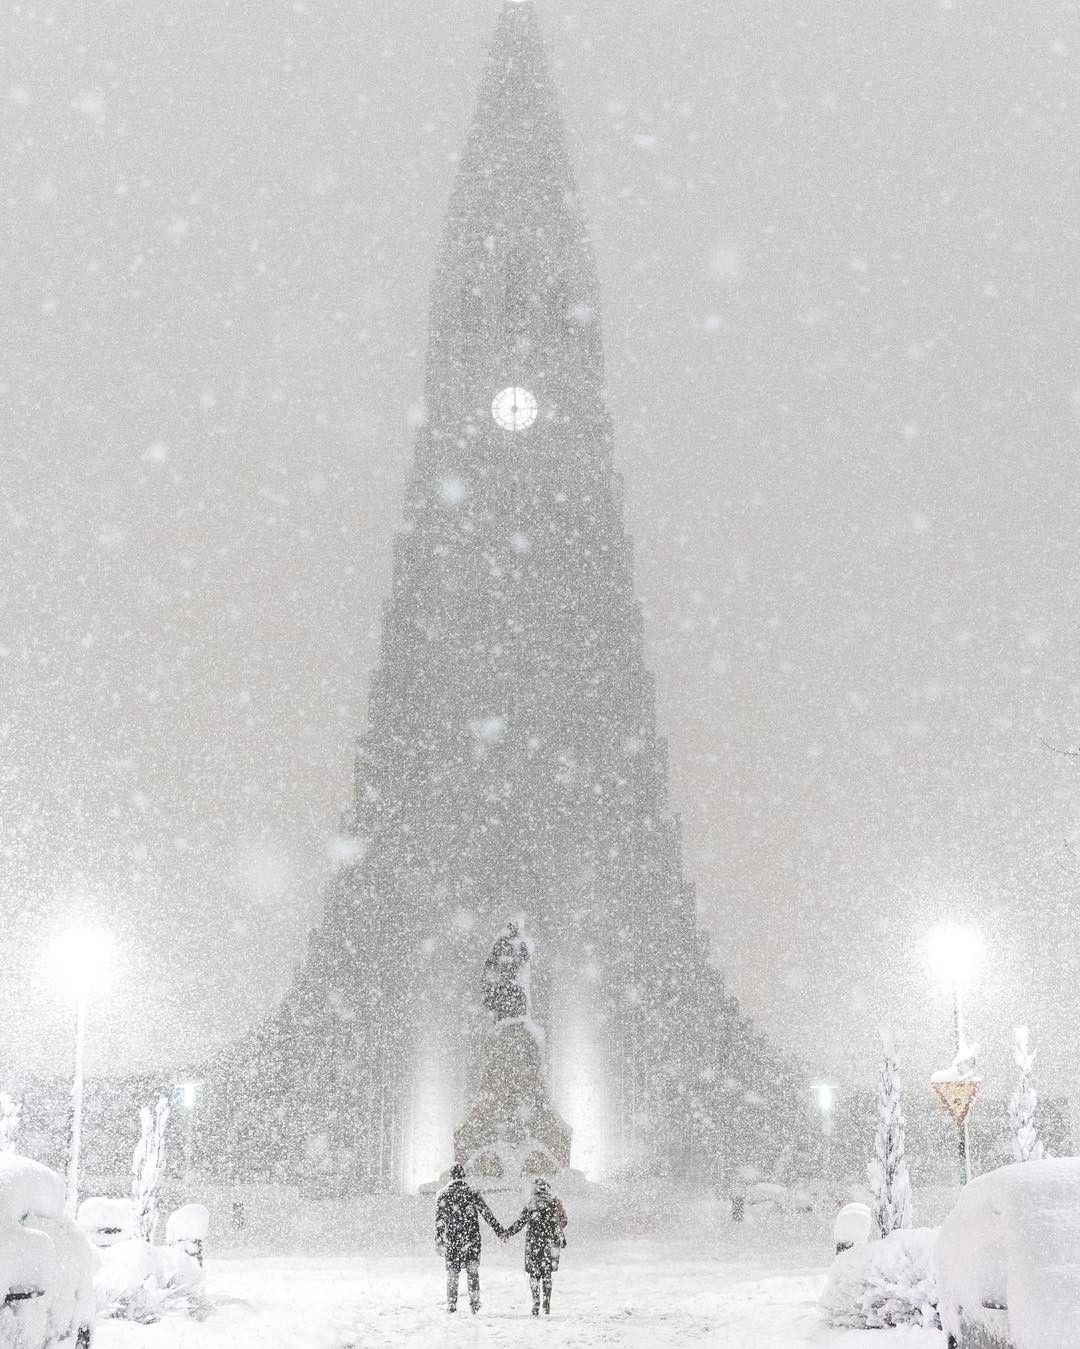 celandic_explorerReykjavík, Iceland Piace a 17.553 persone 2 g ...